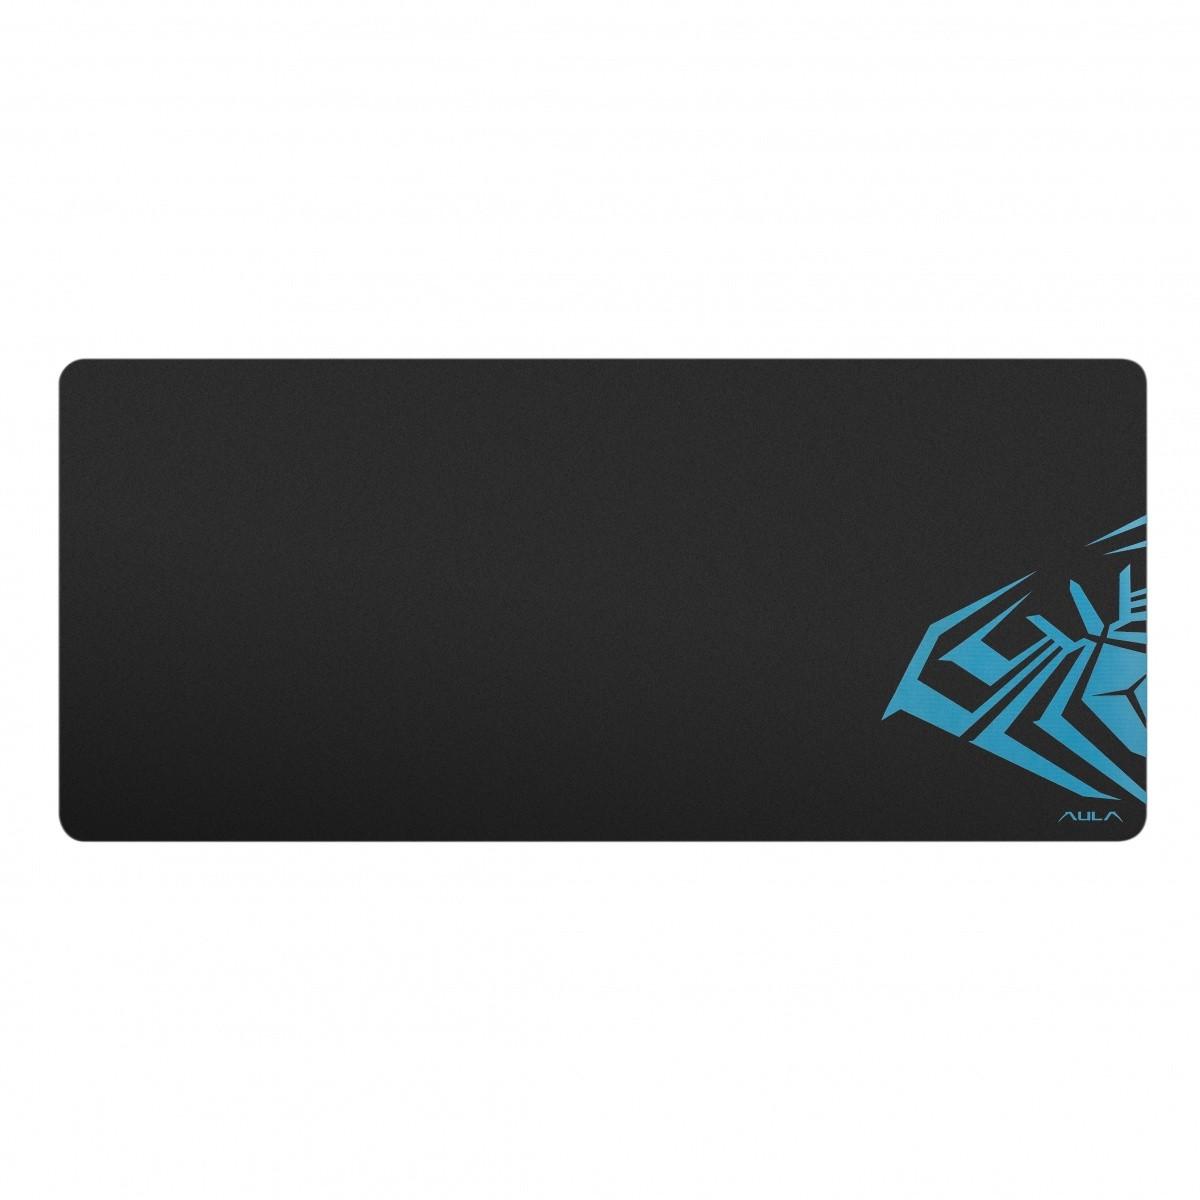 Podkladka pod mysz dla graczy Magic Pad XL